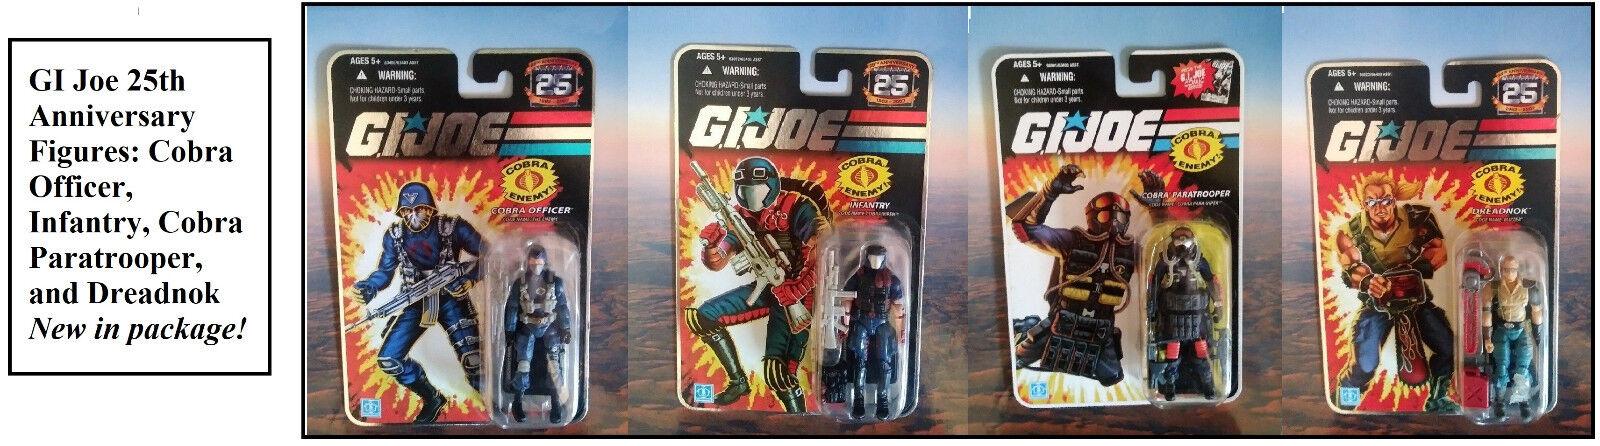 GI Joe Figure Set of 4 Cobra Officer, Infantry, Cobra Paratrooper, Dreadnok NEW